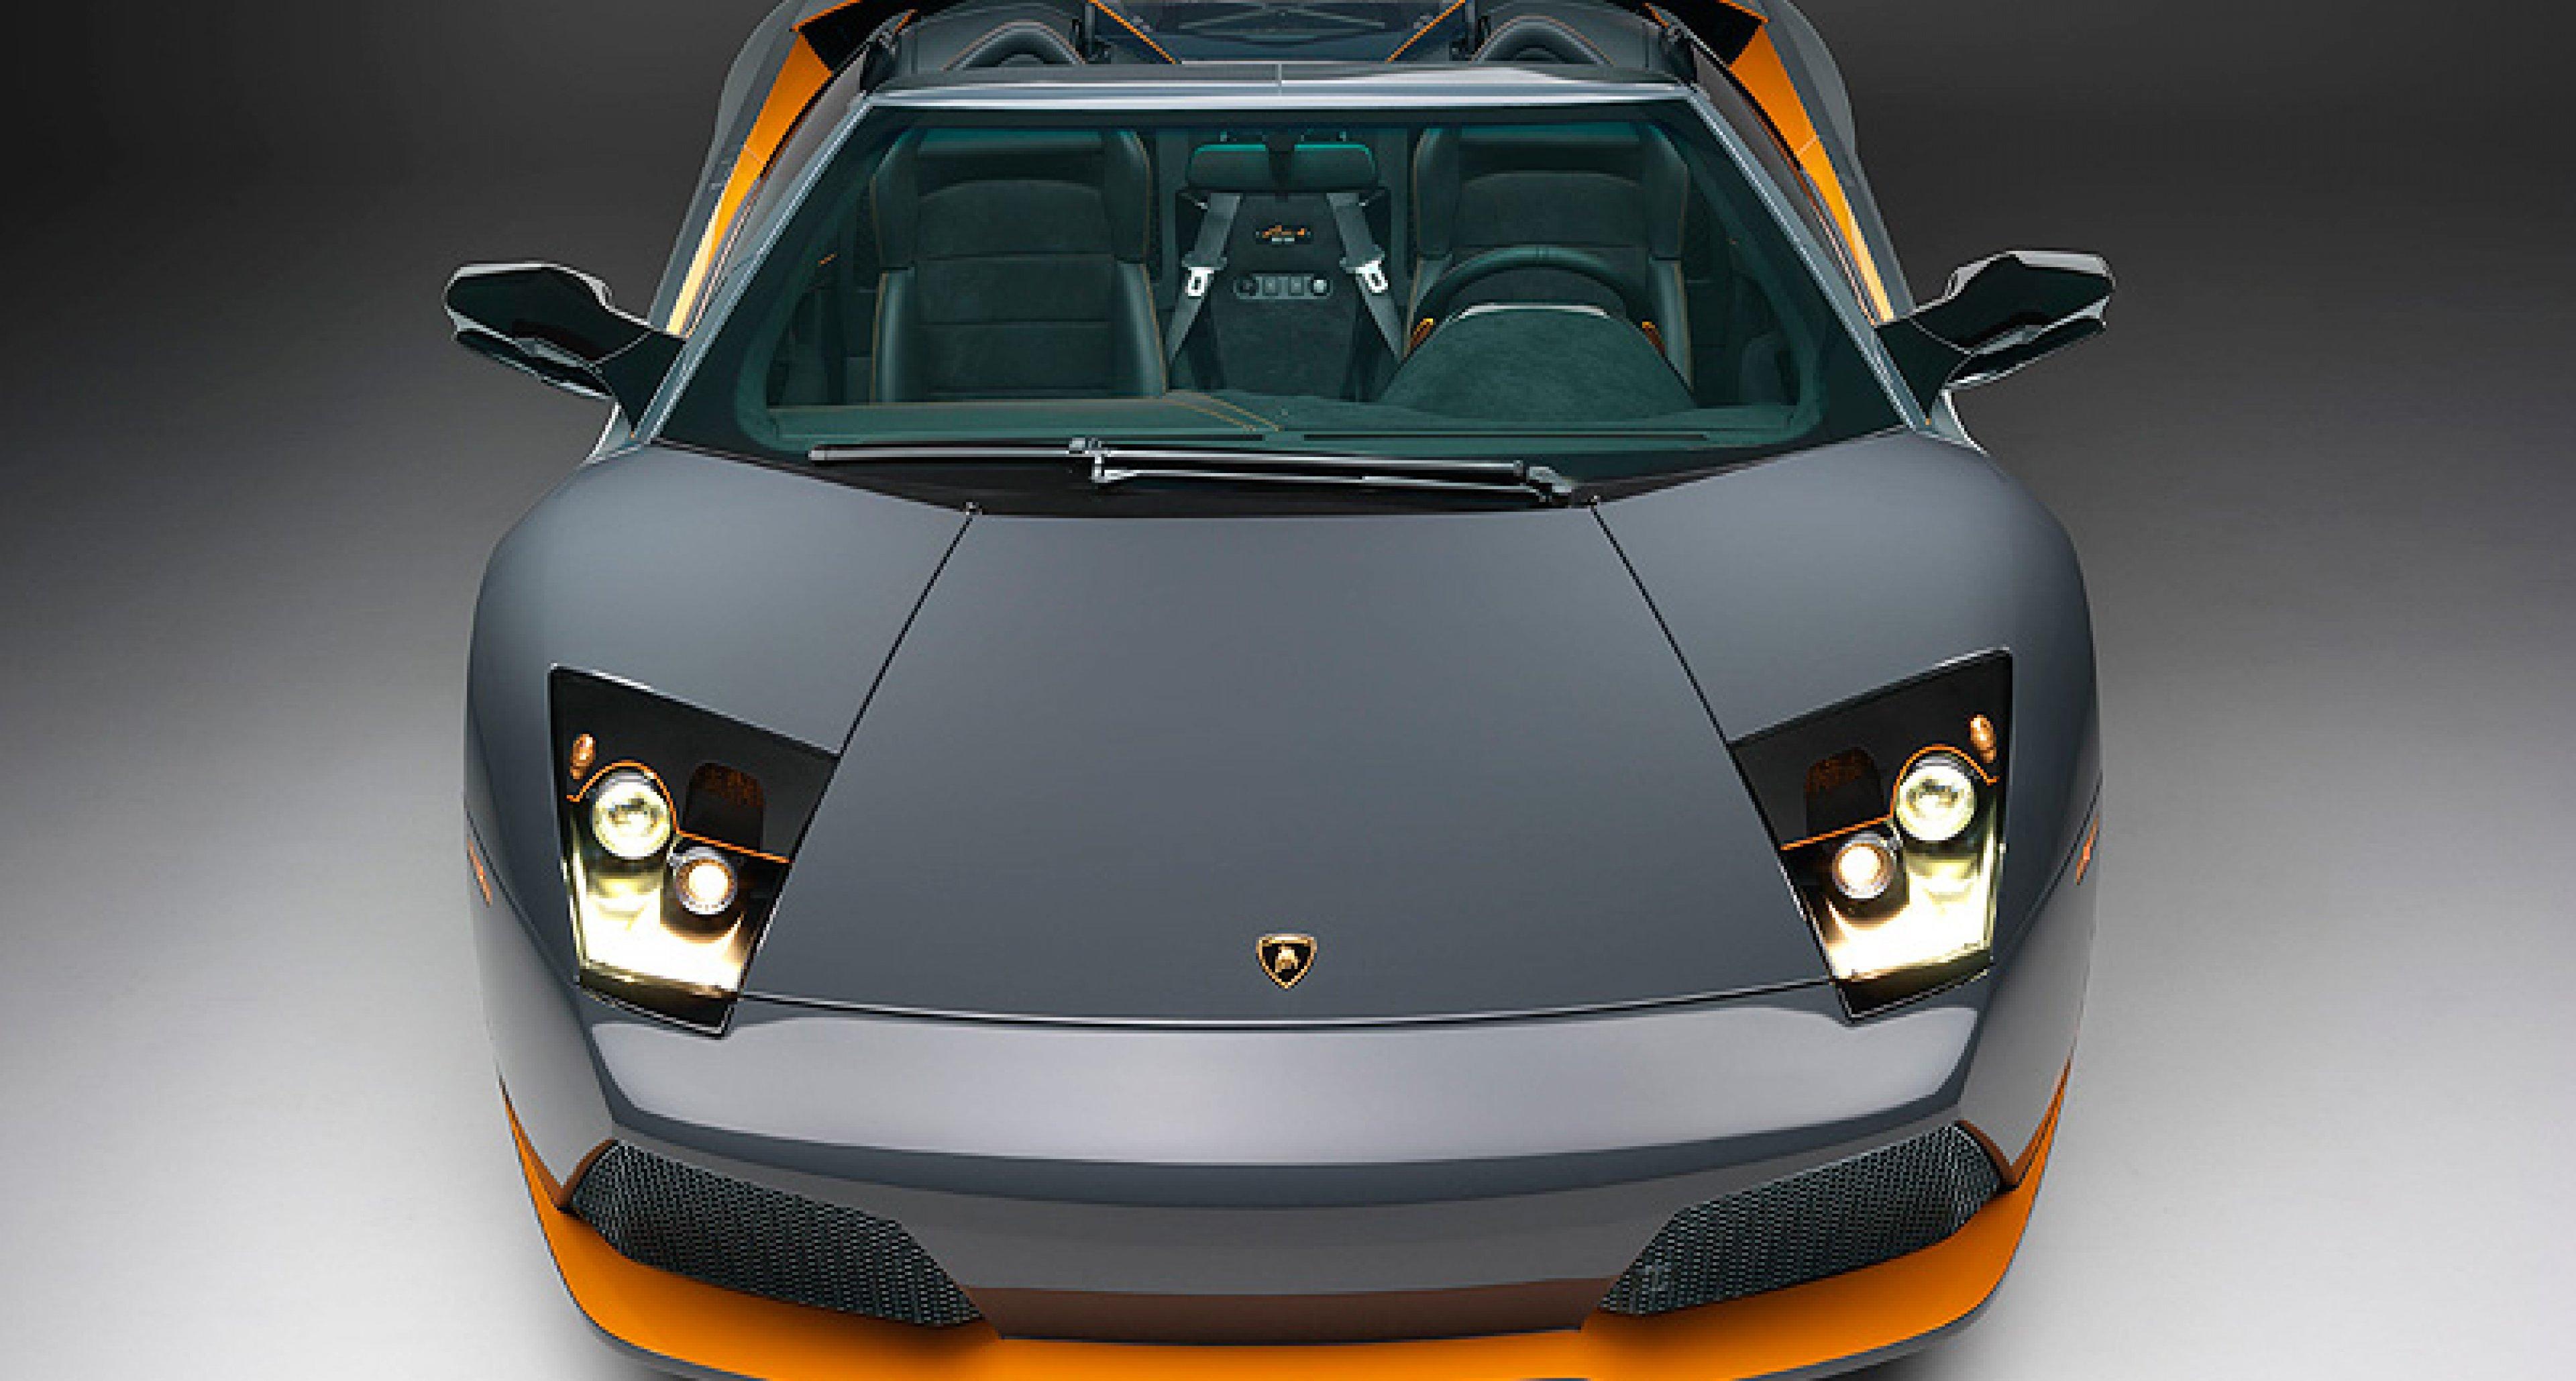 Lamborghini Murciélago LP 650-4 Roadster